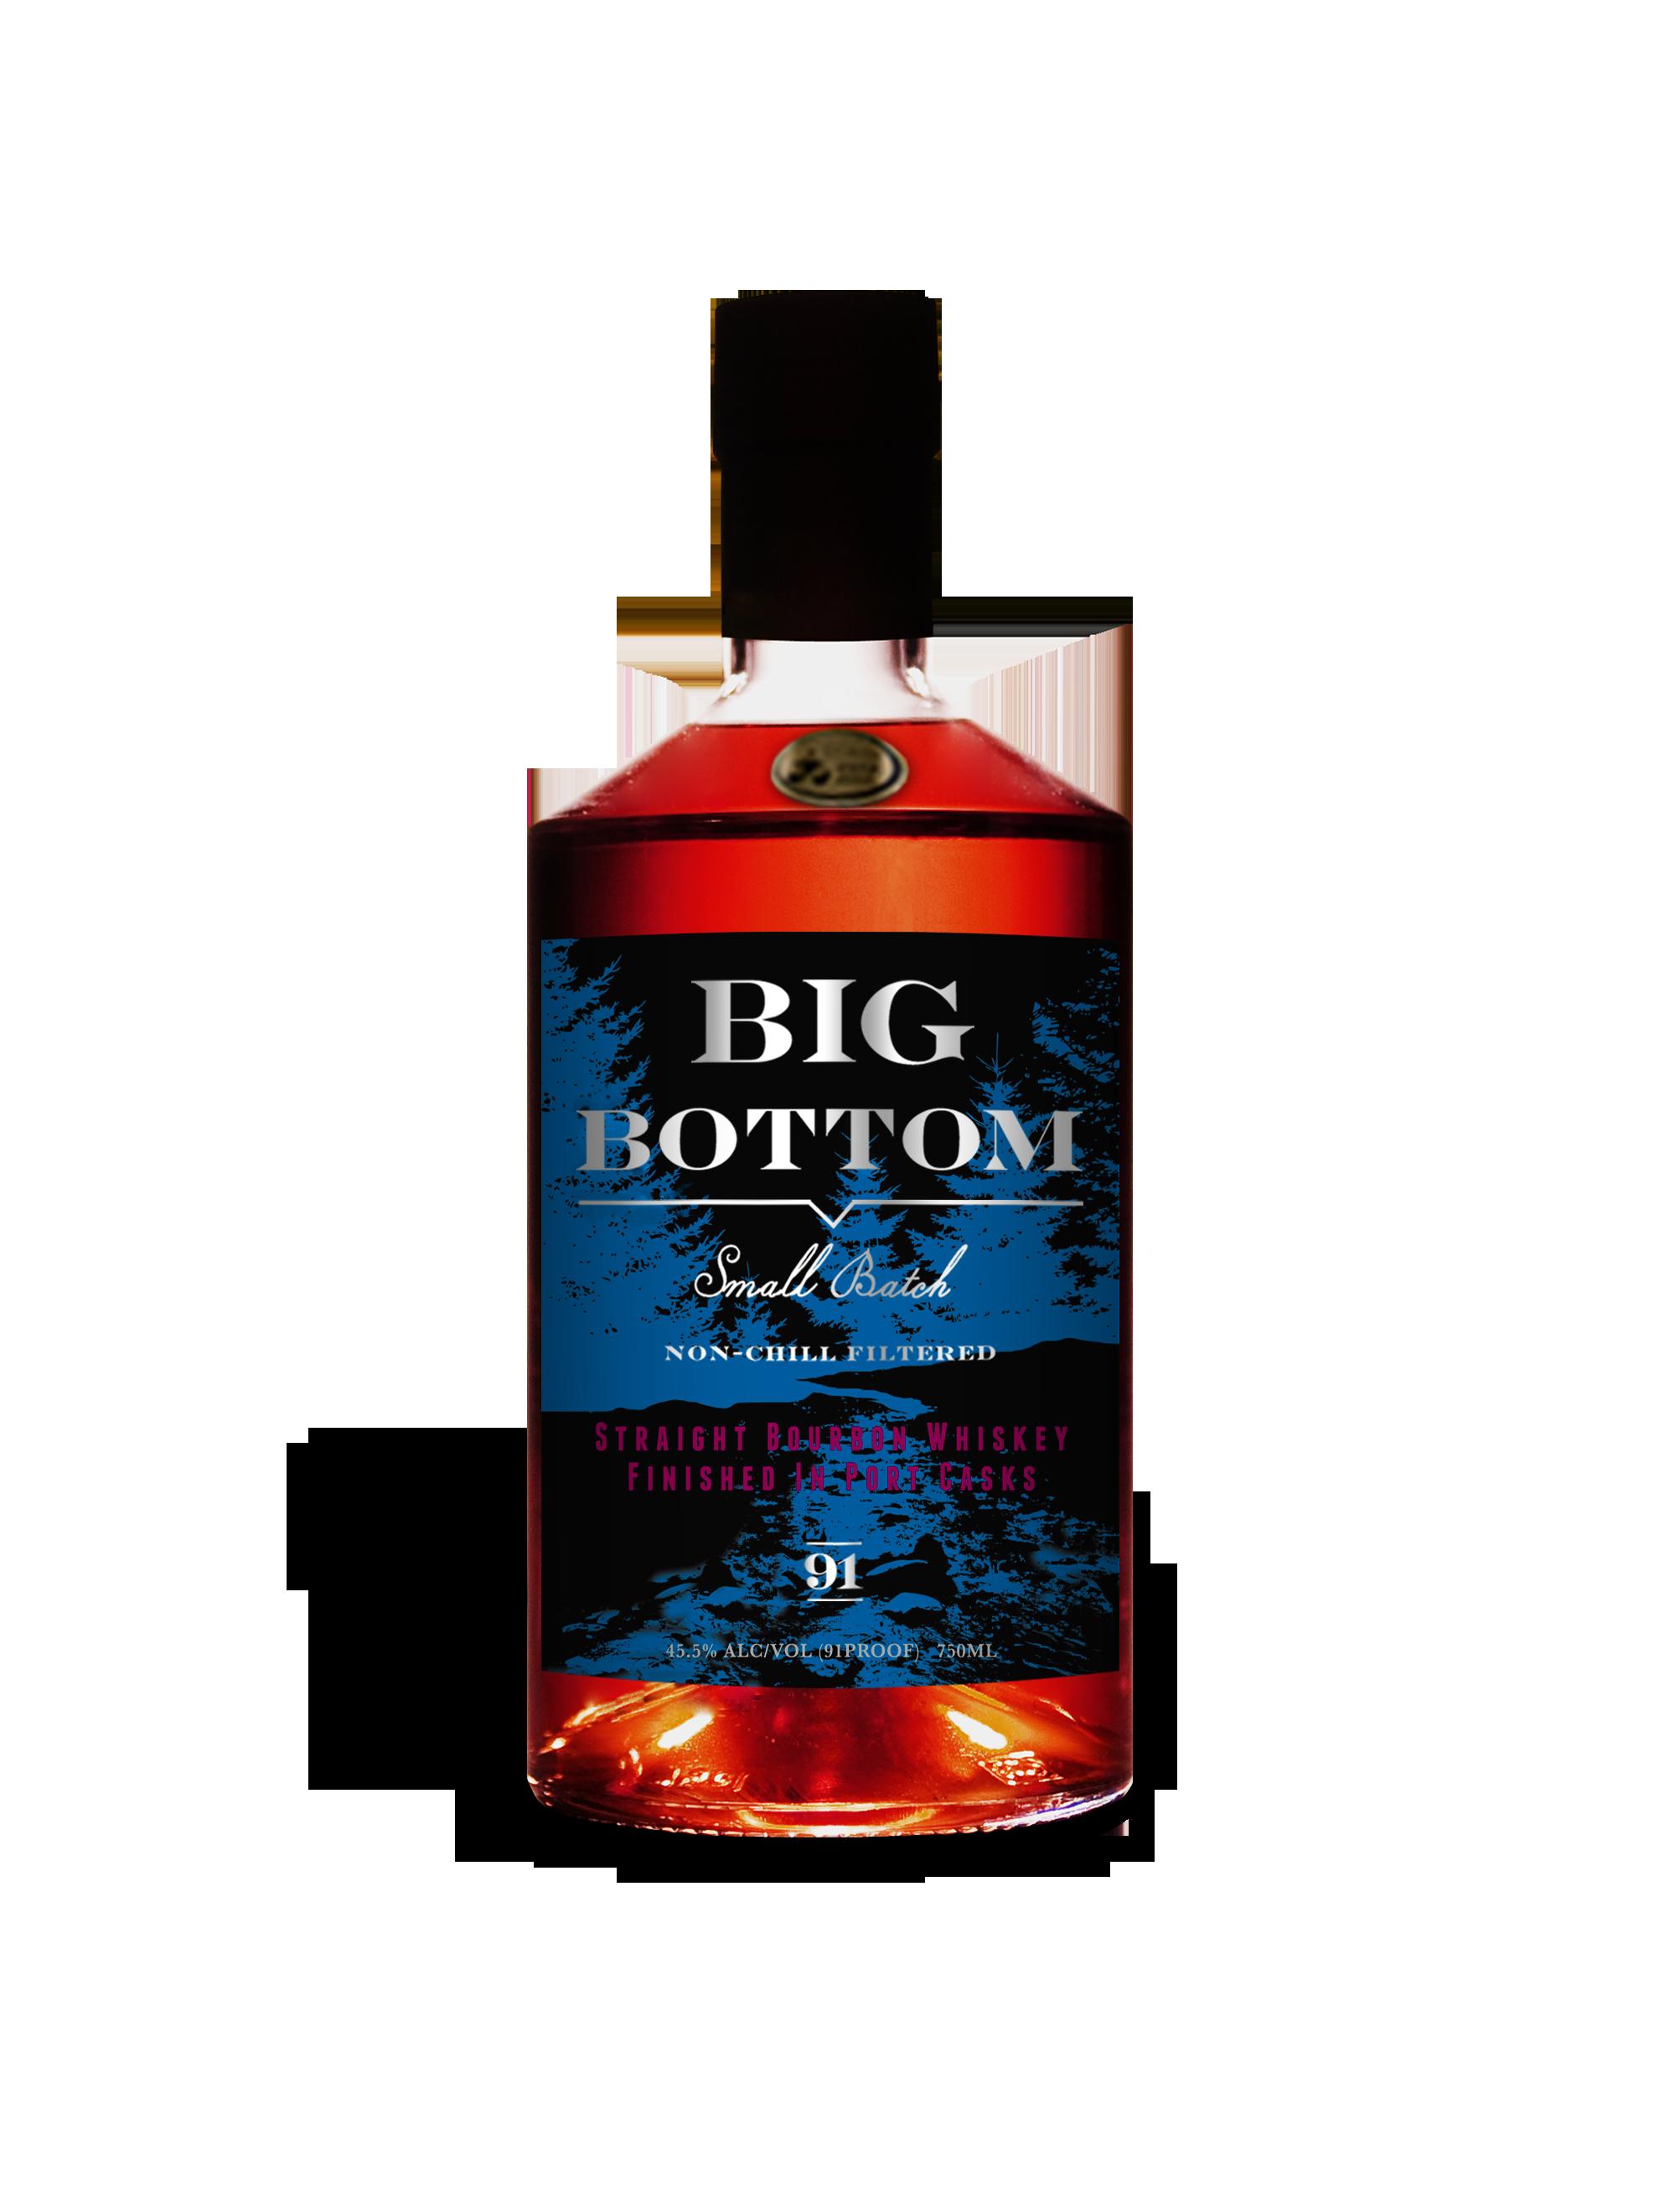 Big Bottom Straight Bourbon Whiskey Port Cask Finish (2012, 5 years old)